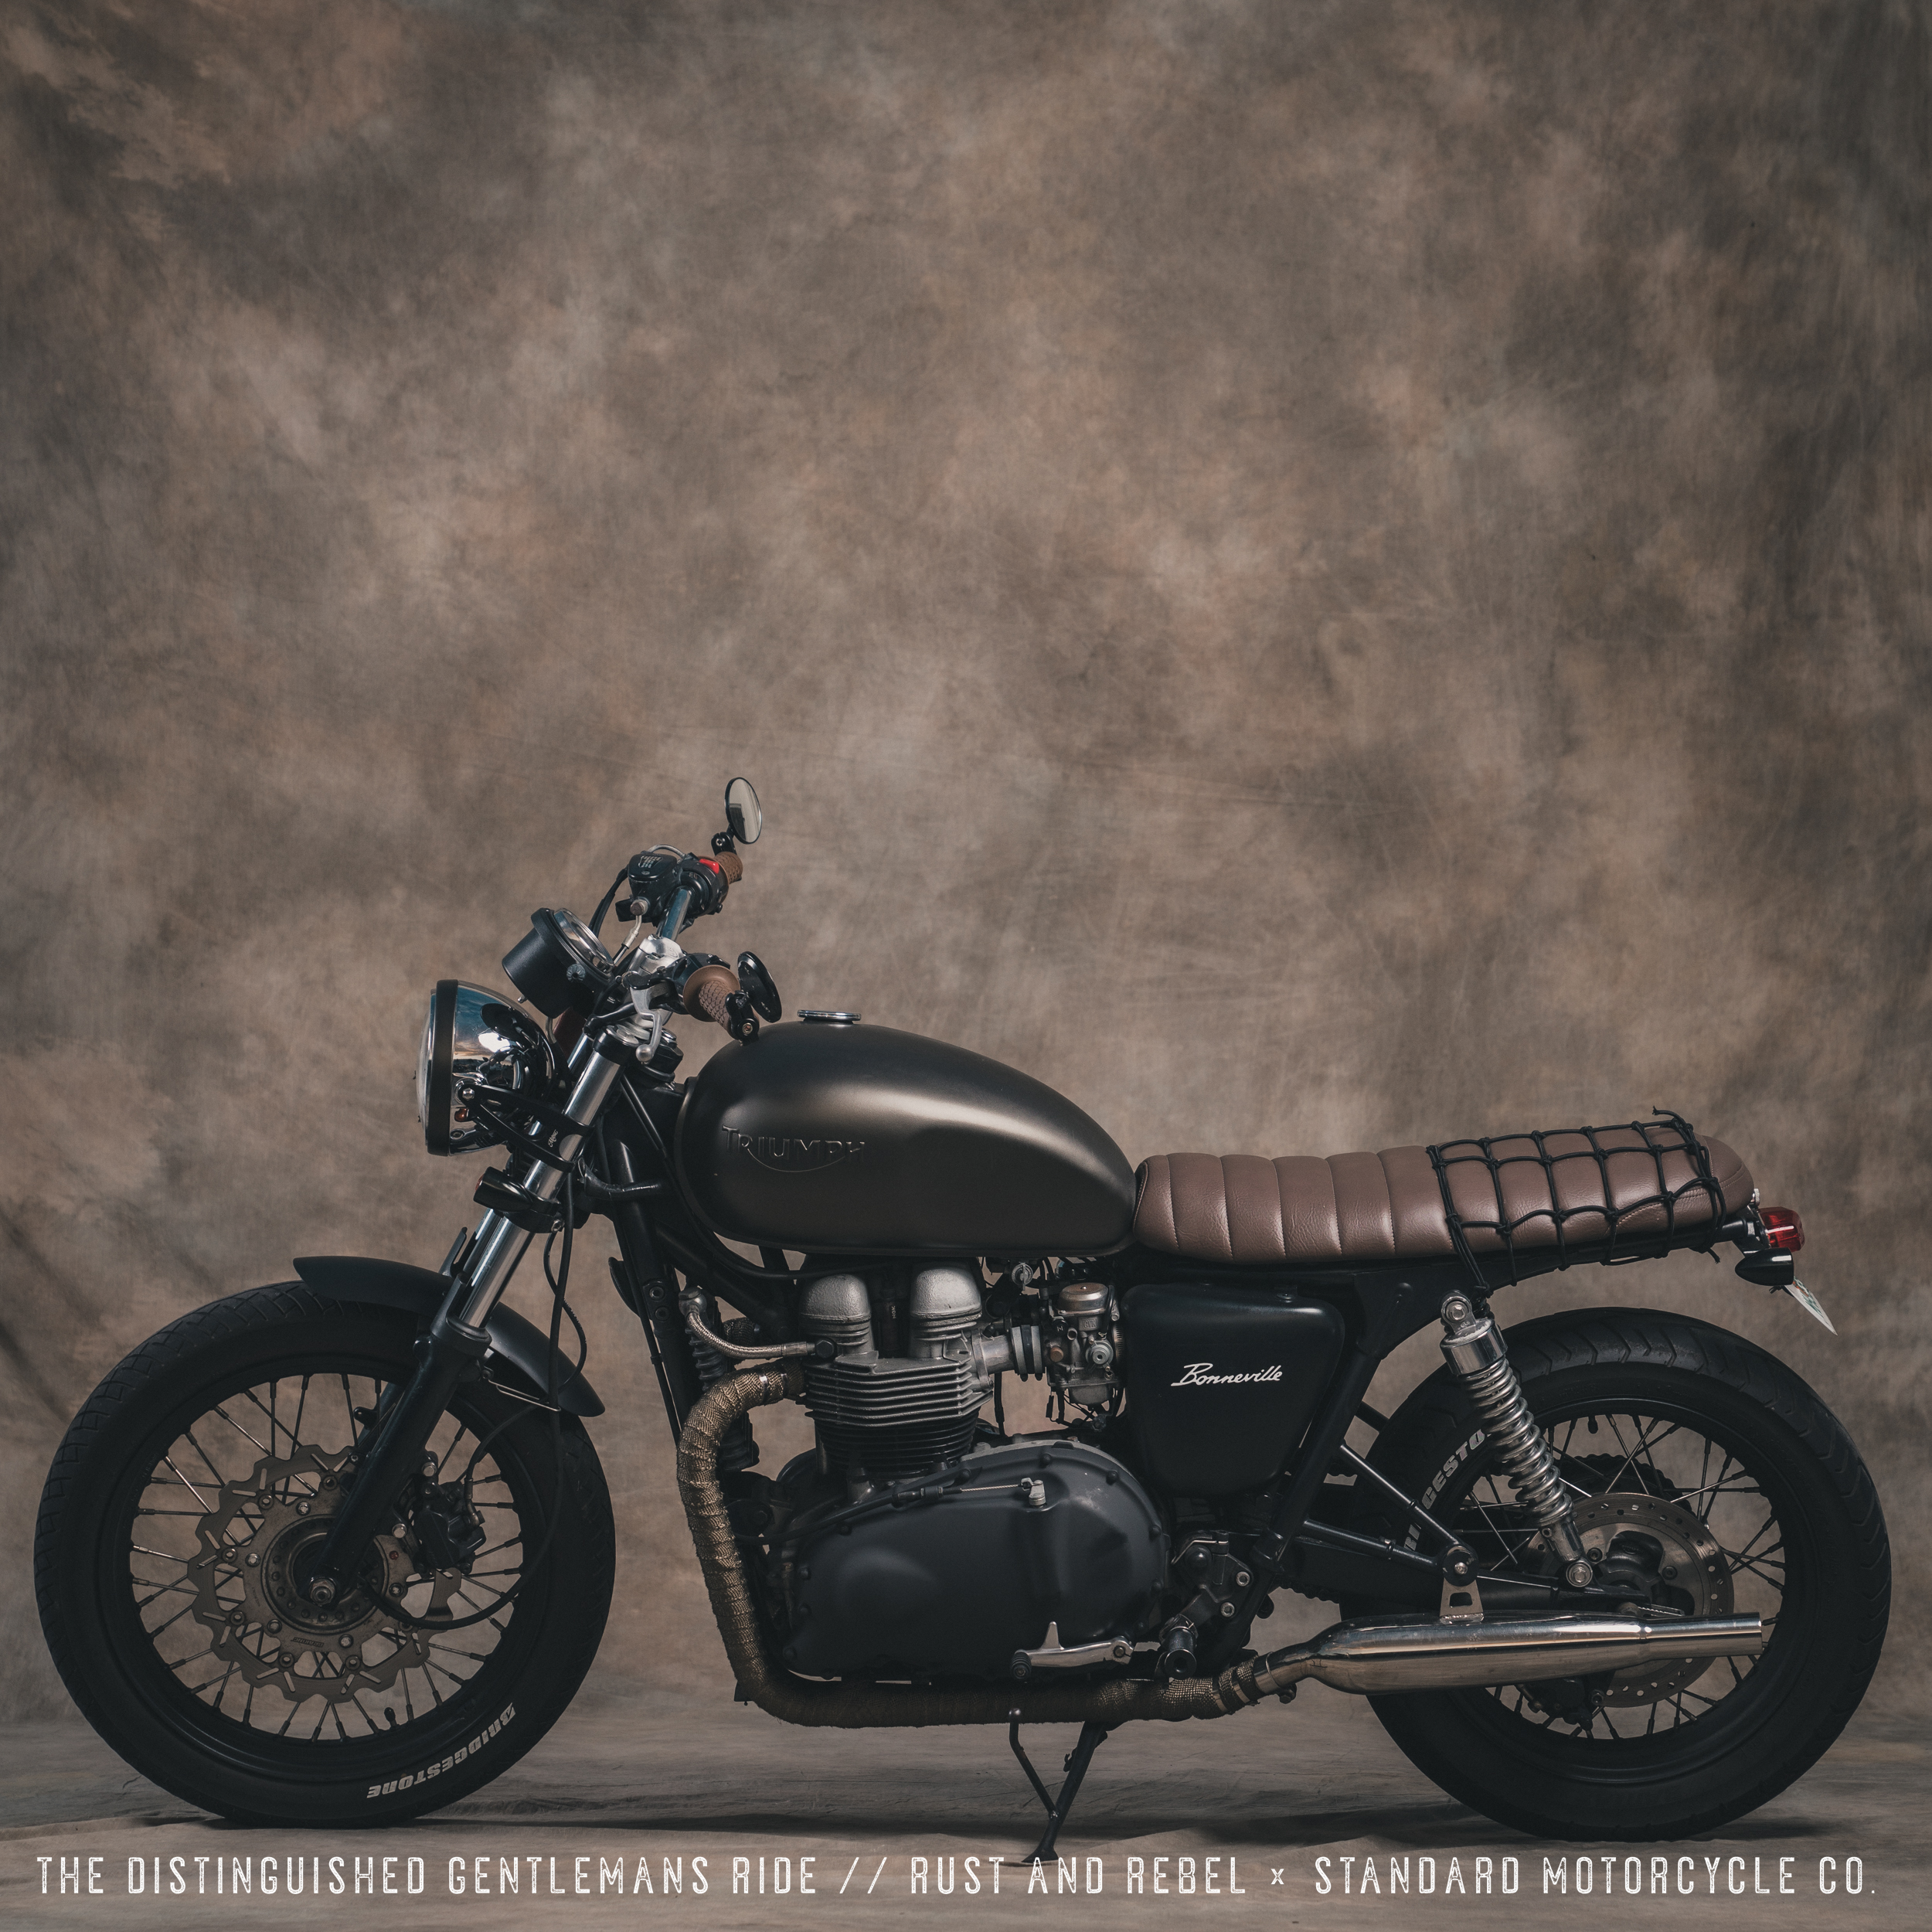 The Distinguished Gentleman's Ride 2019 [BIKES - PHOTO BY @MIKEDUNNUSA] - 0006.jpg